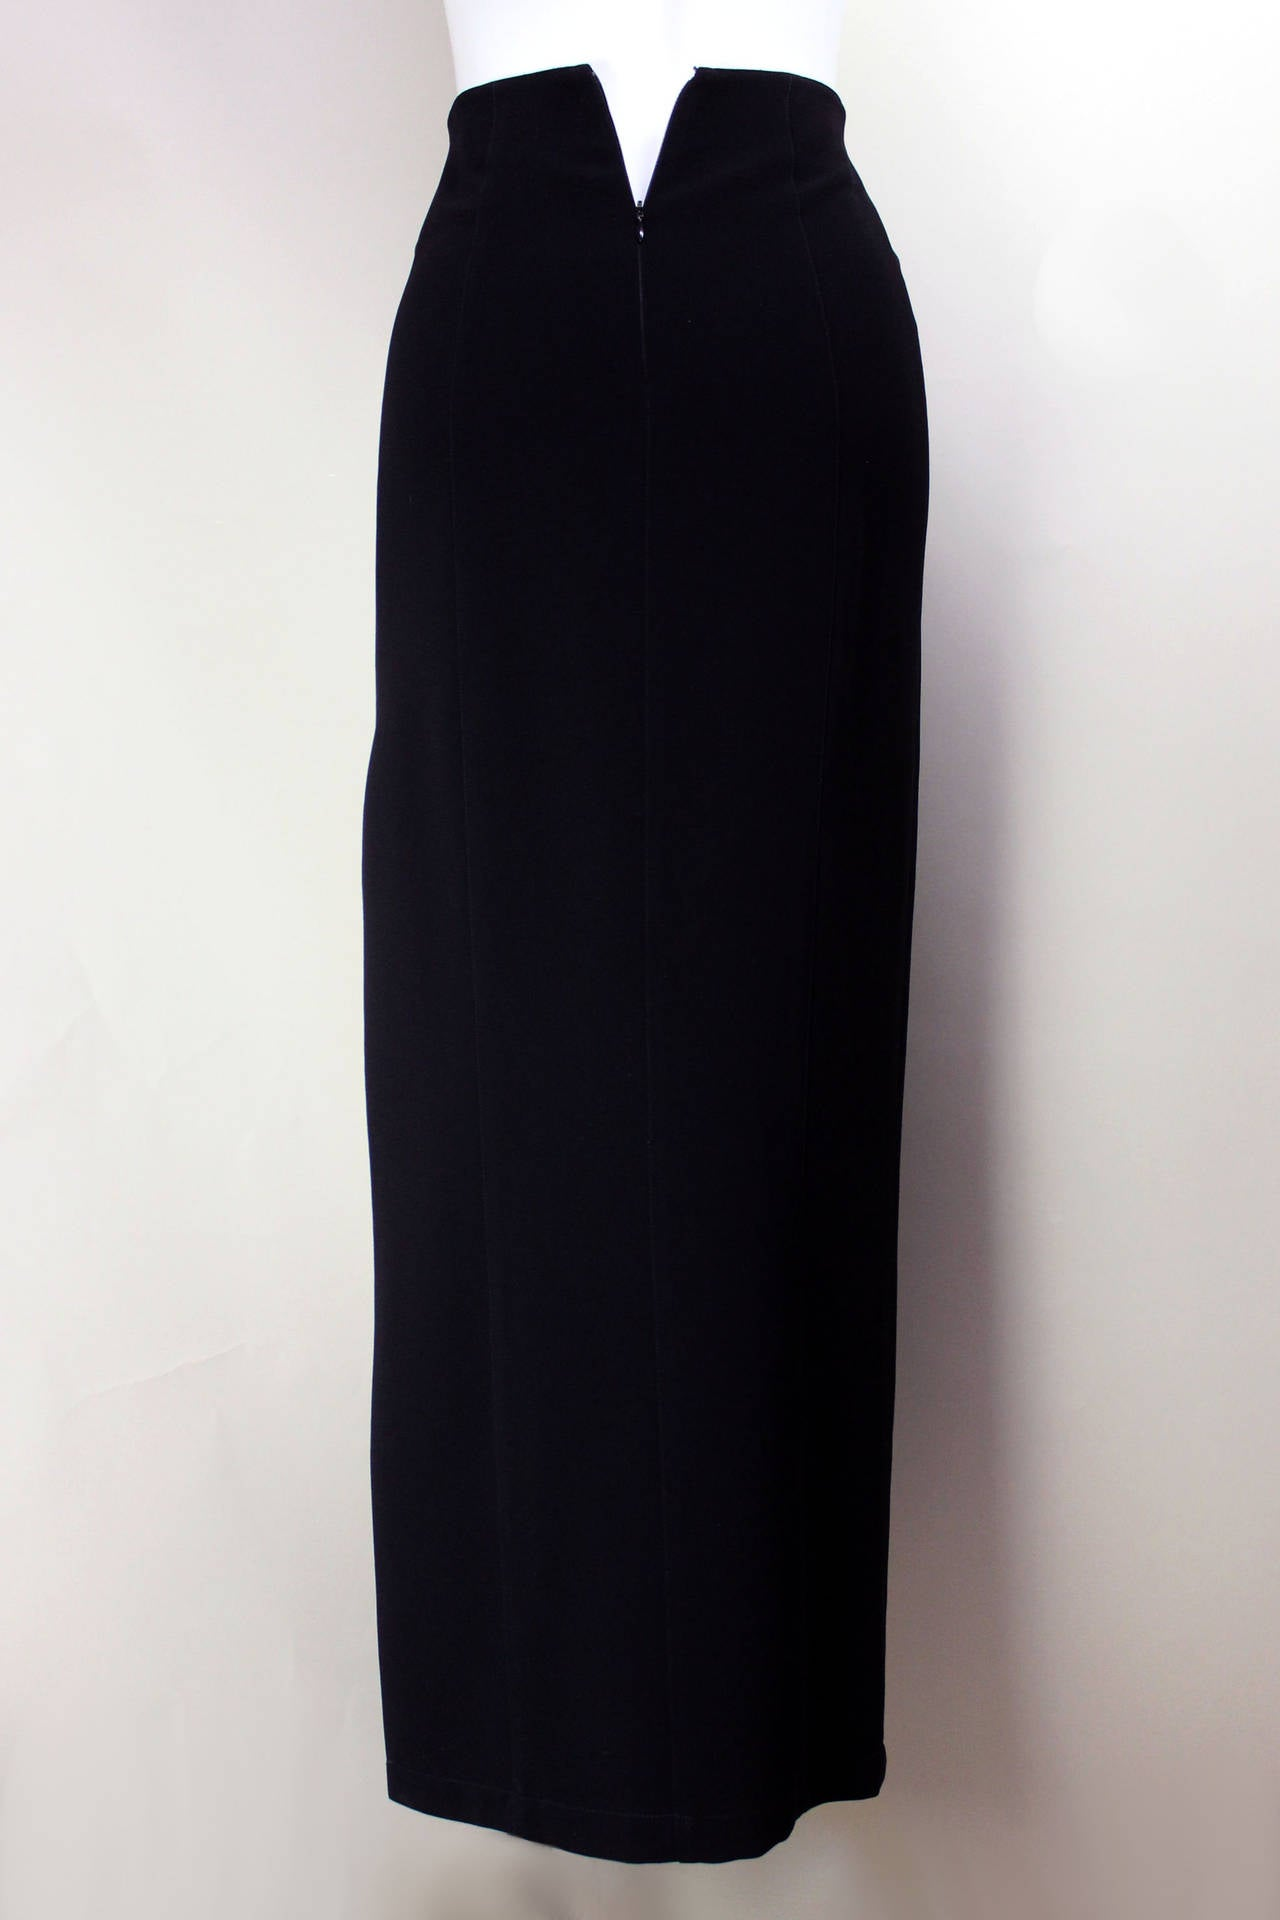 1980s Thierry Mugler Sexy Long Pencil Skirt 3